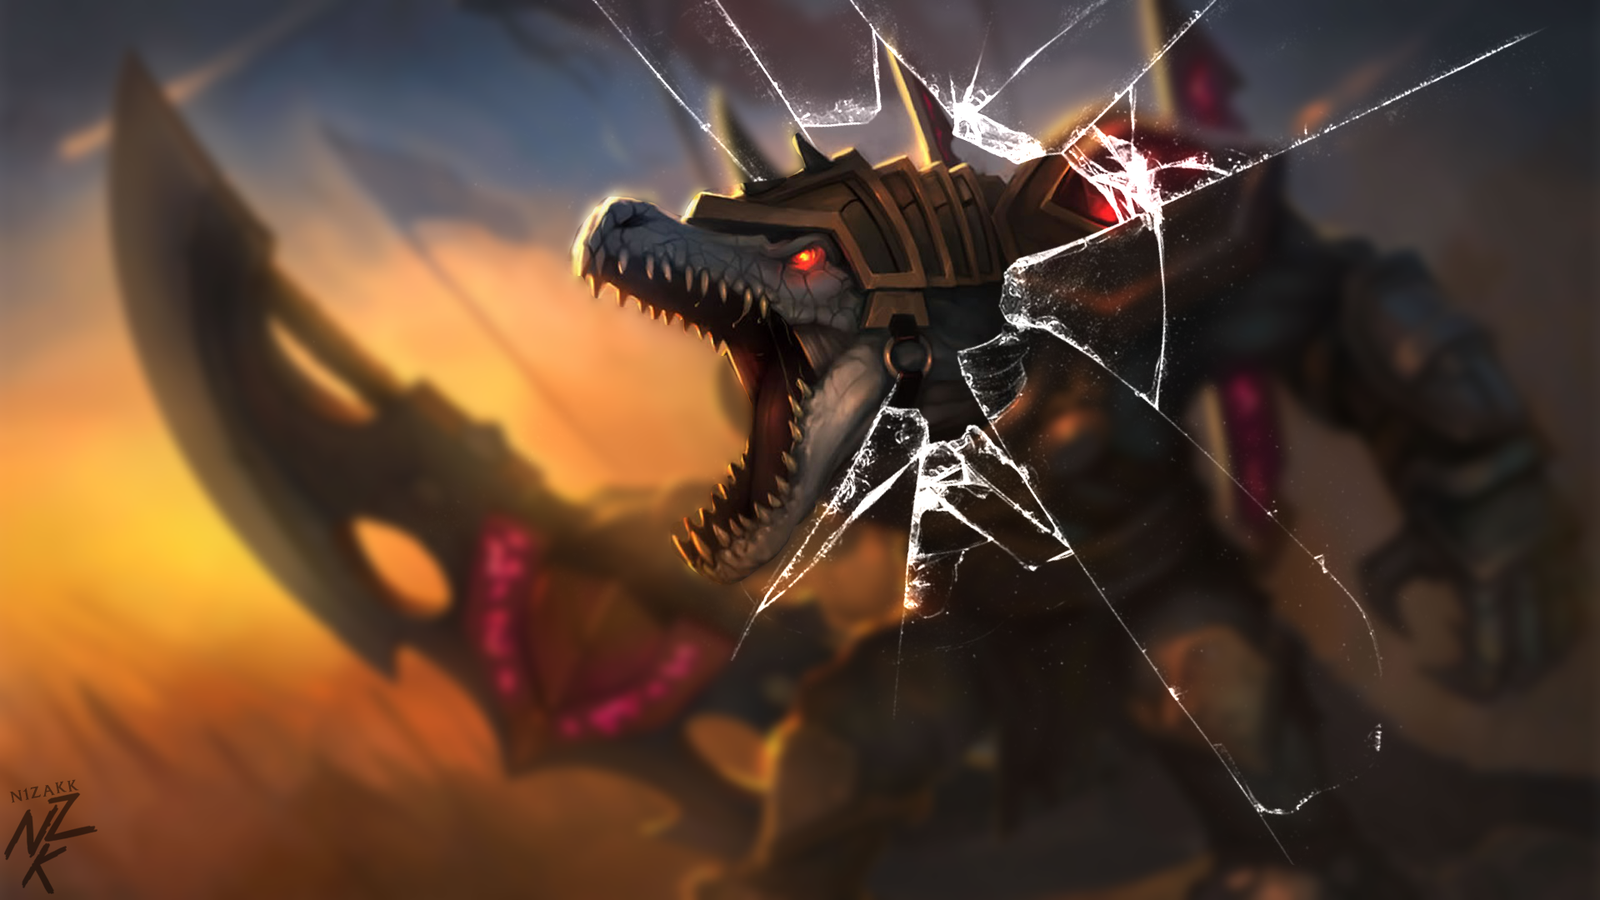 Broken Screen League of Legends Wallpaper Full HD For Desktop 1600x900